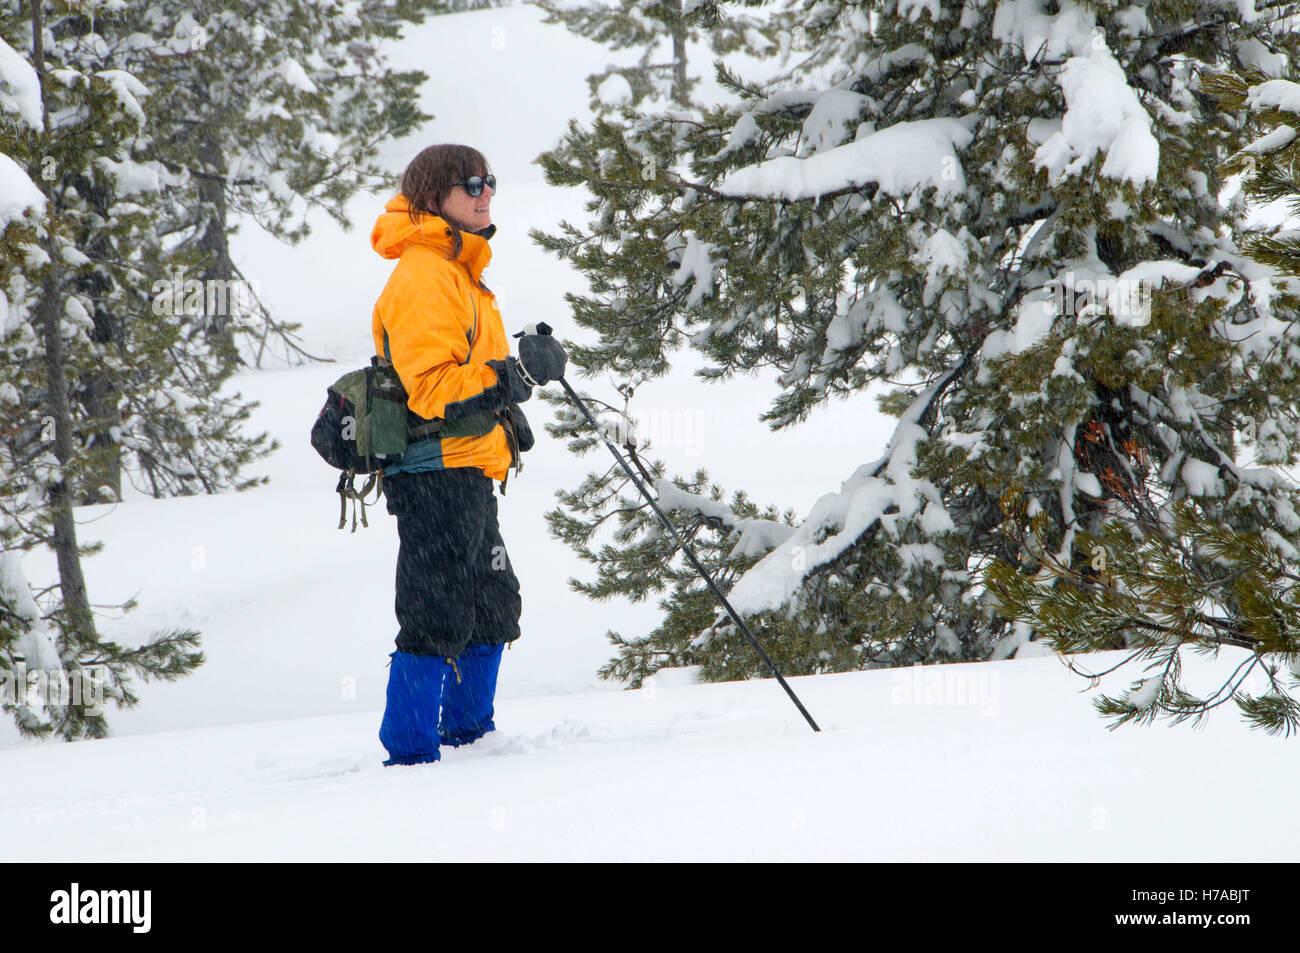 Snowshoeing near Benson Sno-park, Santiam Recreation Area, Willamette National Forest, Oregon - Stock Image